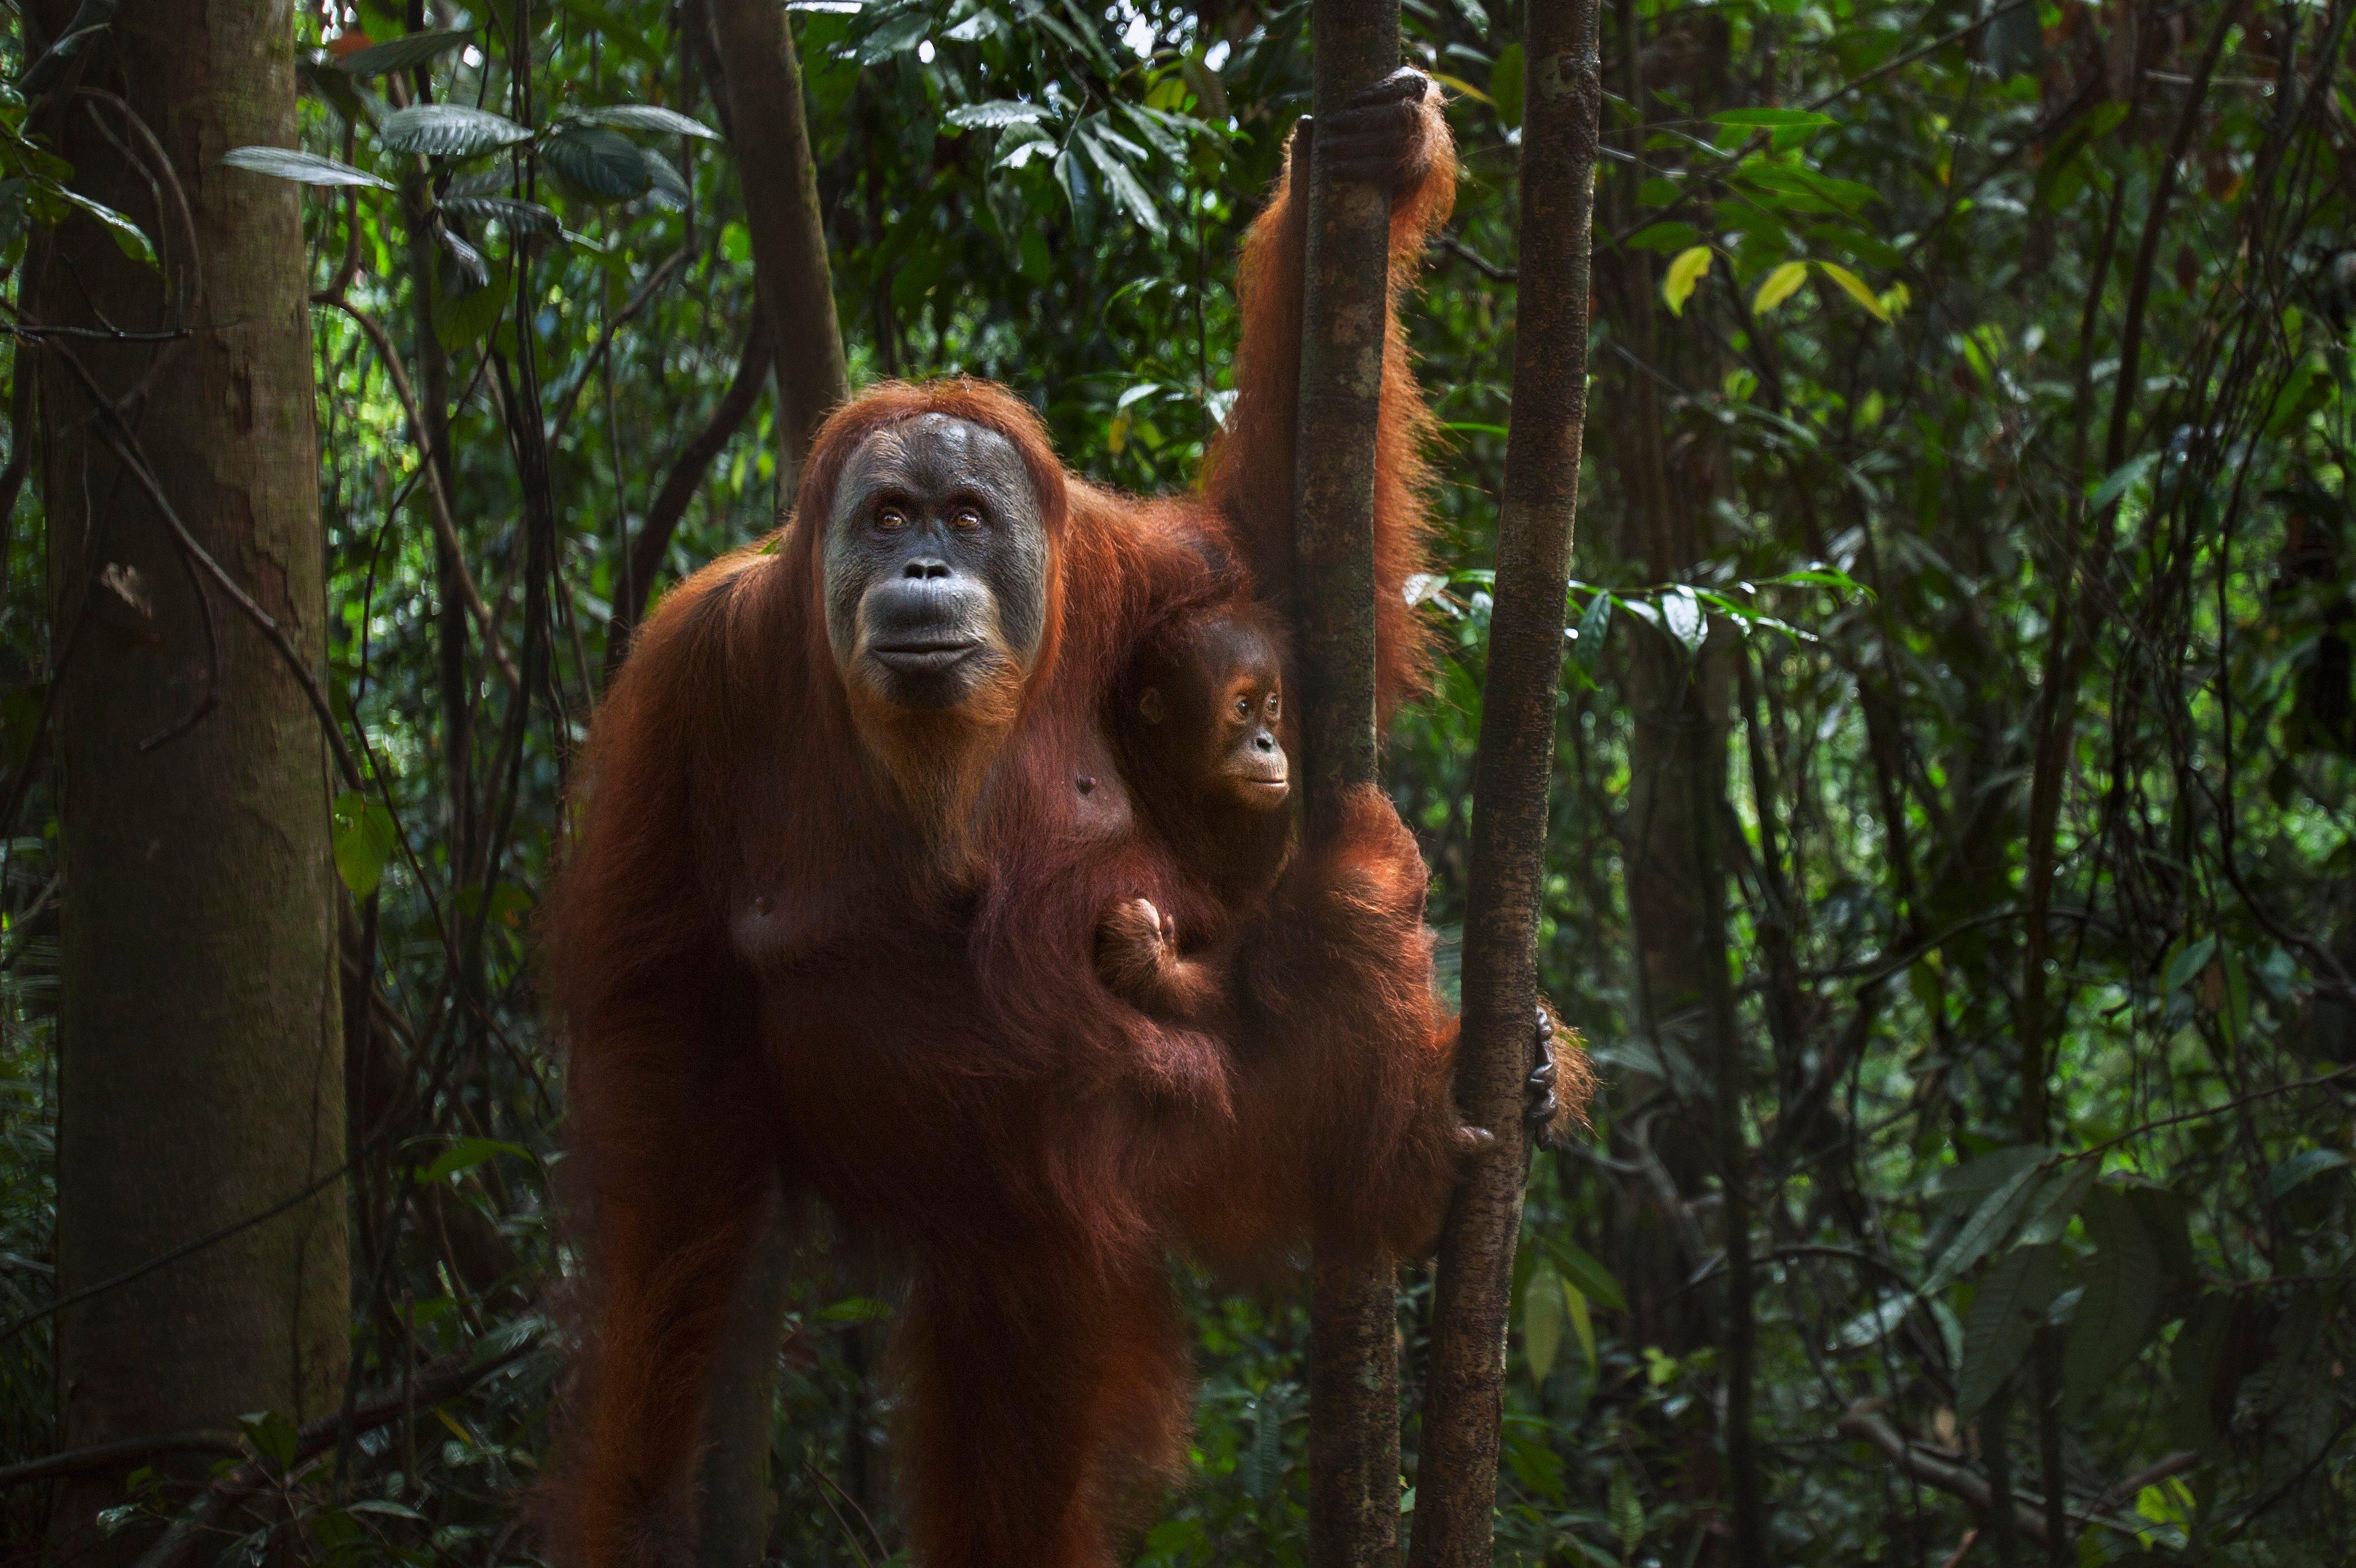 Sumatran Orangutan female 'Suma' aged 36 years carrying her baby daughter 'Sumi' aged 2-3